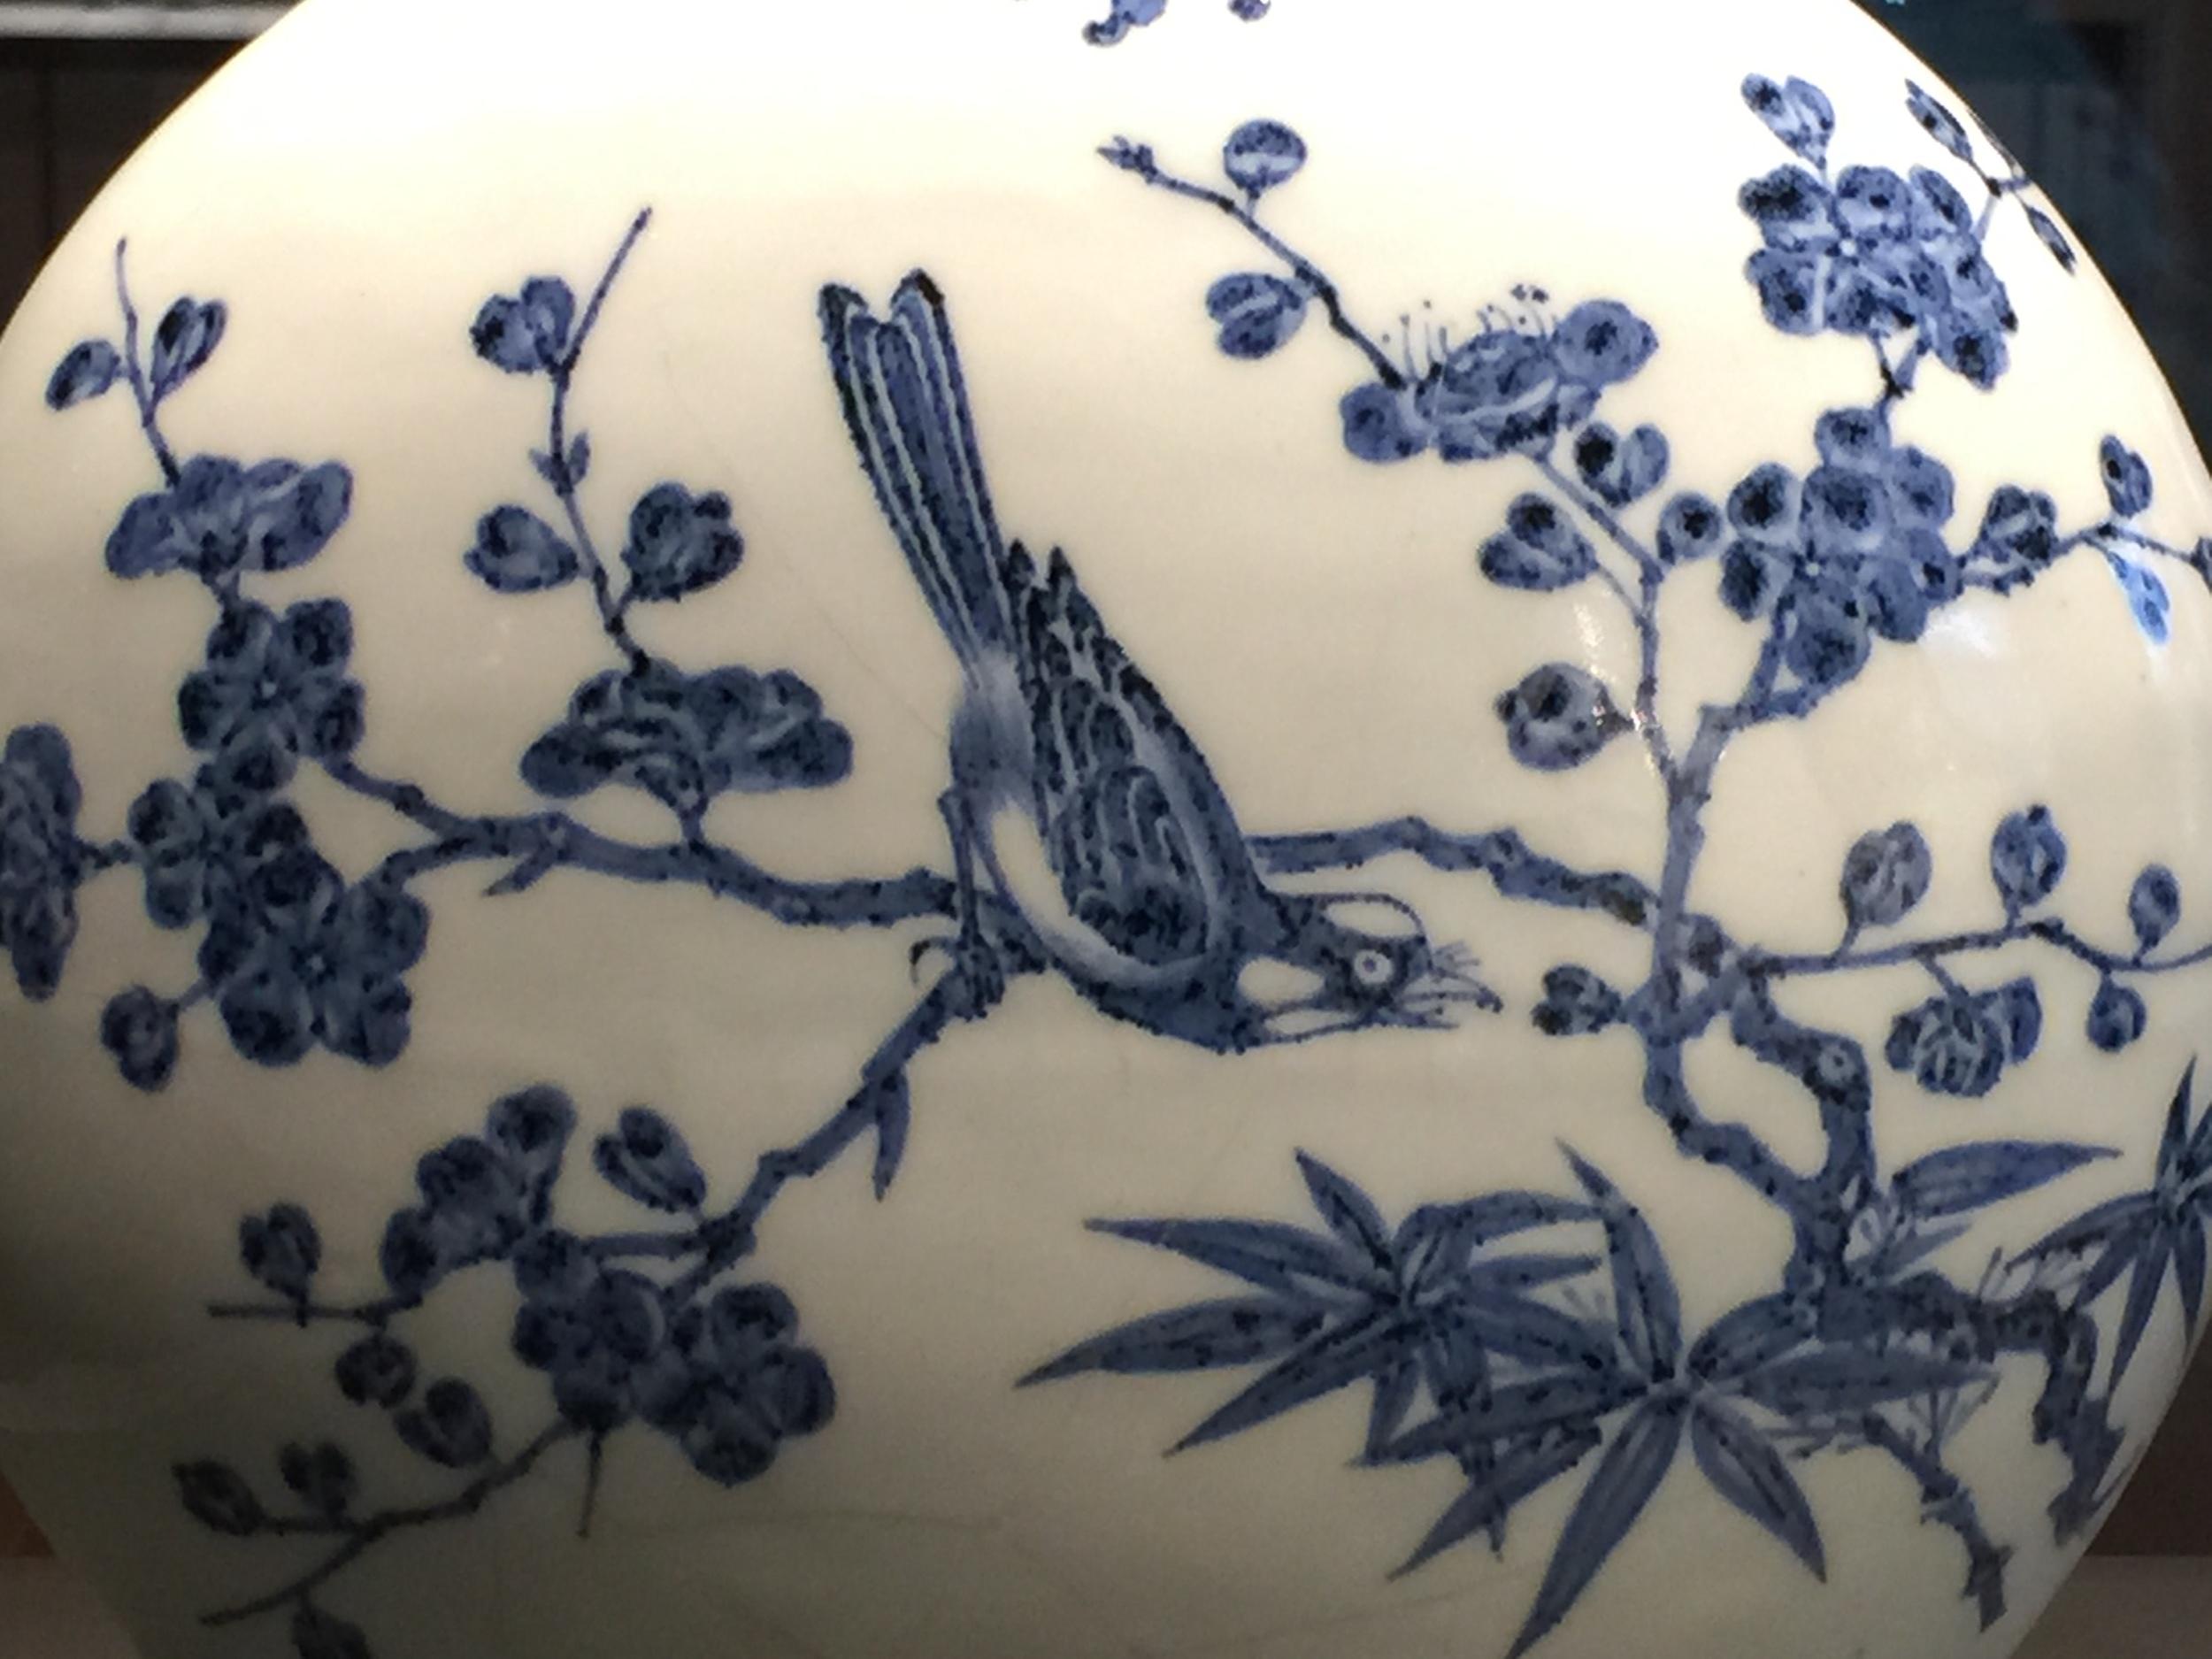 Chinese-Porcelain-British-Museum-Percival-David-jessewaugh.com-48.jpg